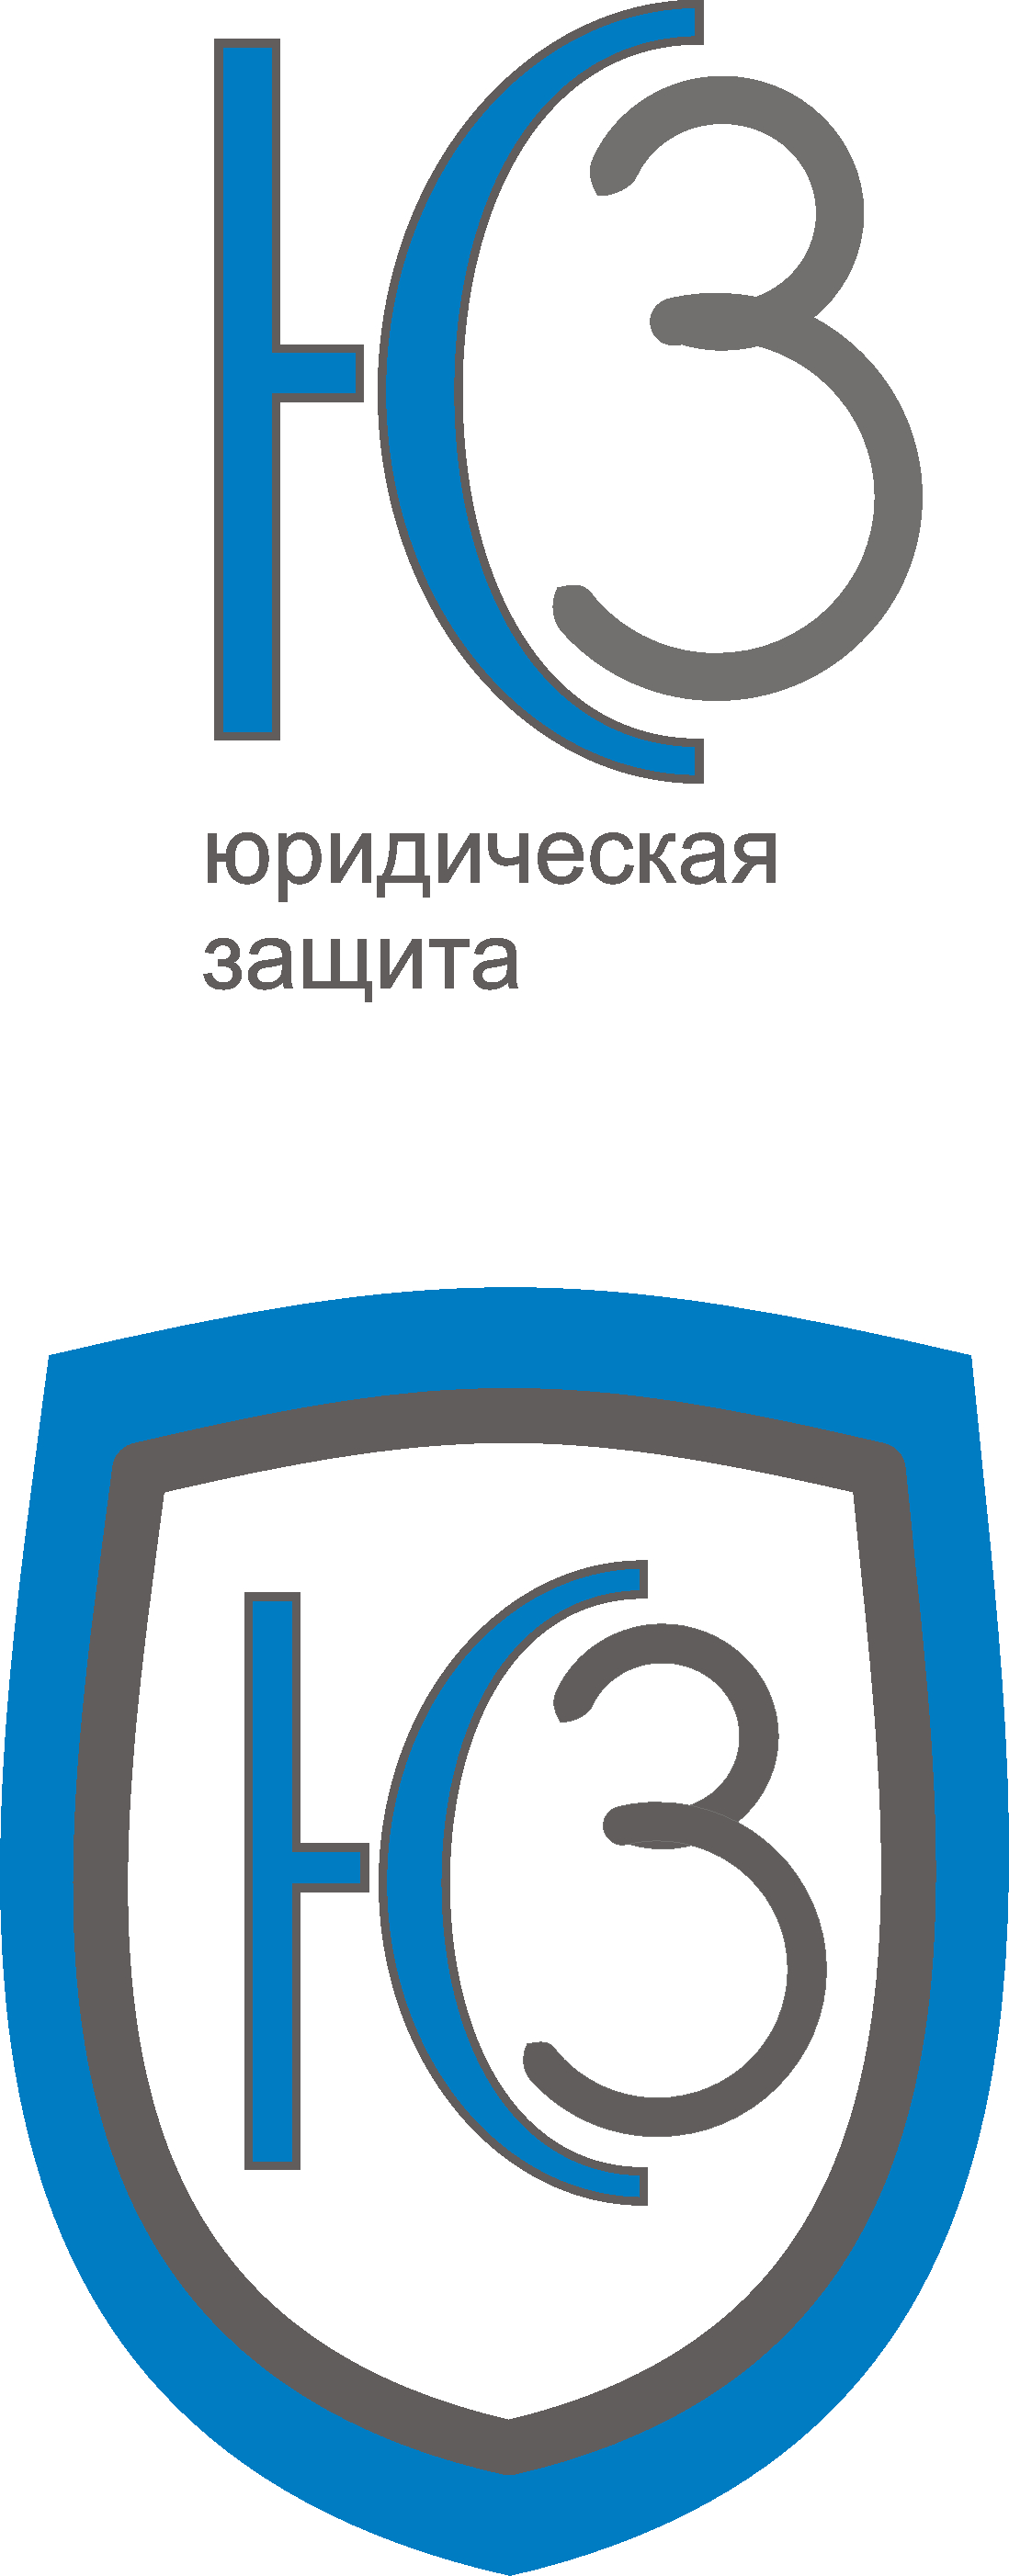 Разработка логотипа для юридической компании фото f_35355dd73c377893.jpg